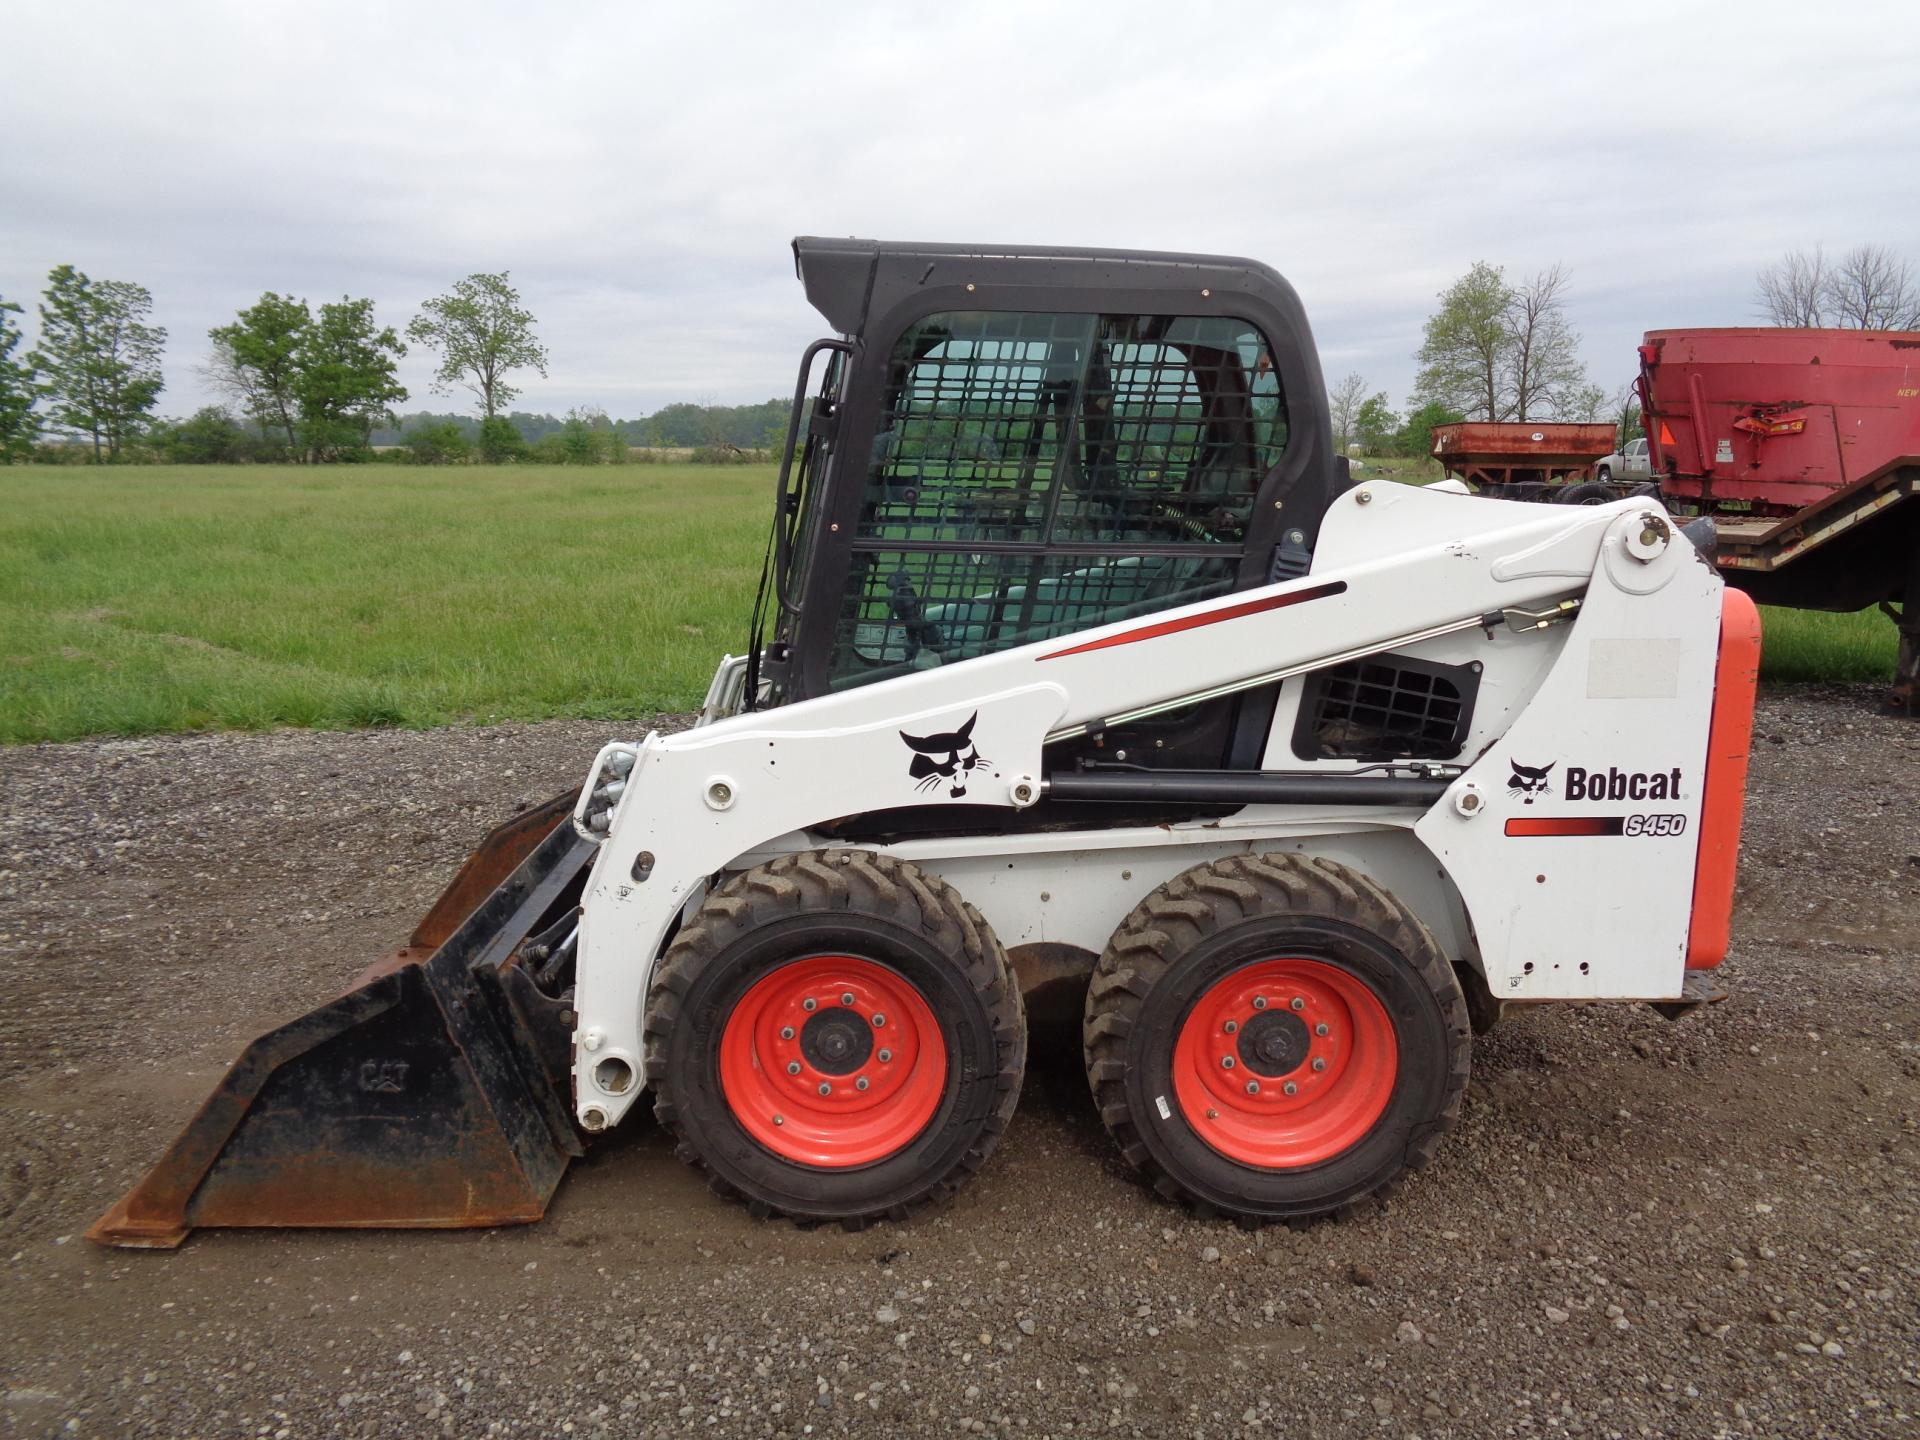 2016 Bobcat S450     $19,900